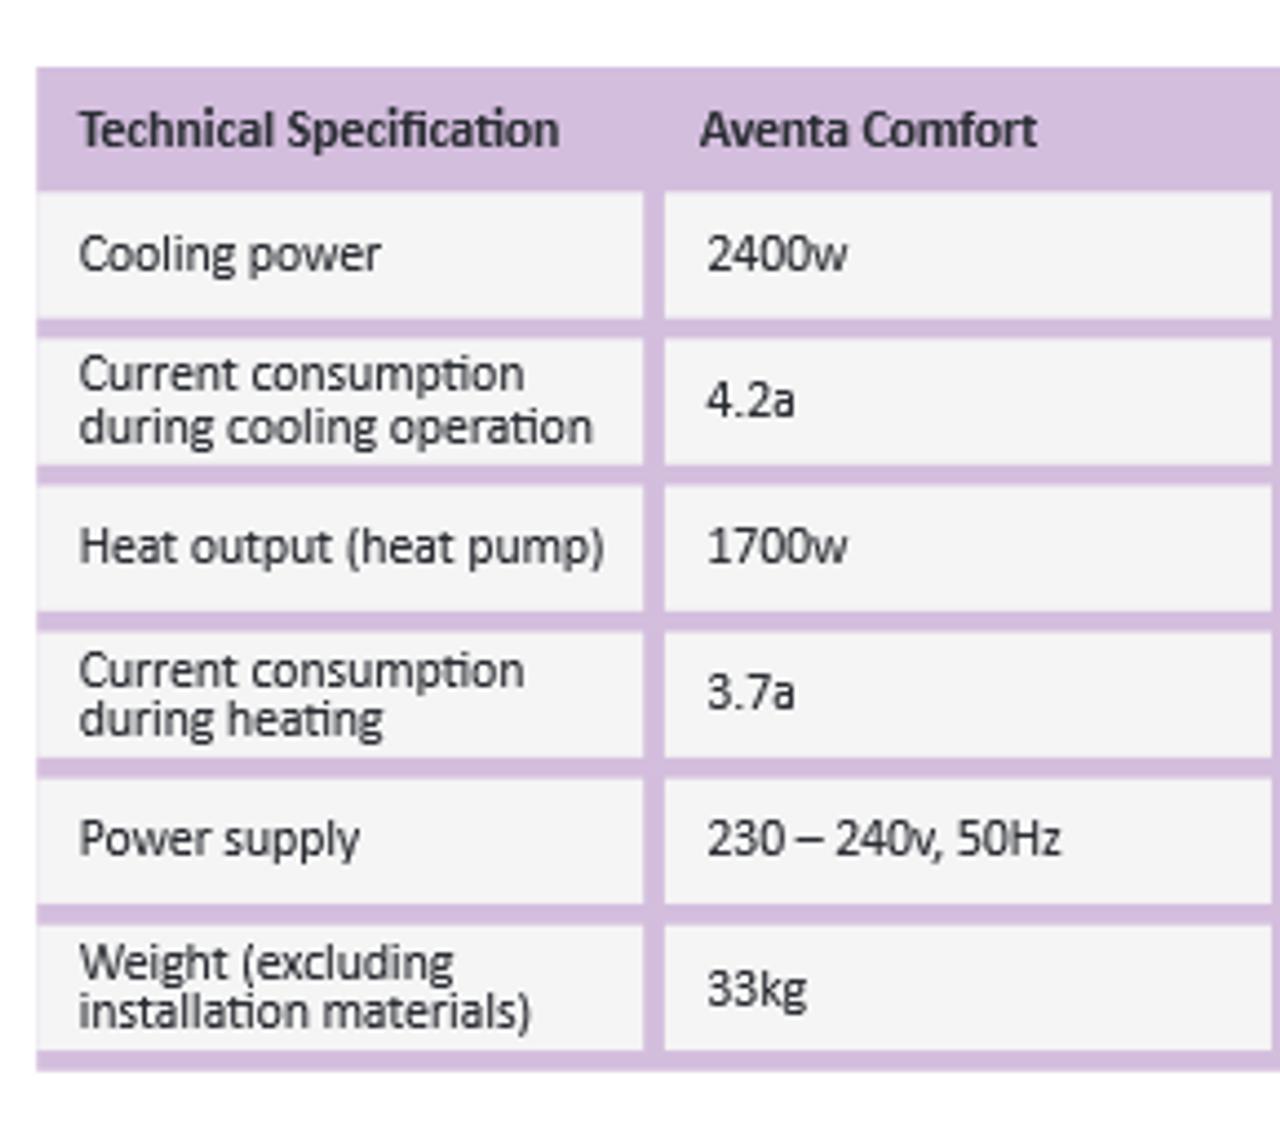 Truma Aventa Eco Caravan and Motorhome Air Conditioning Unit